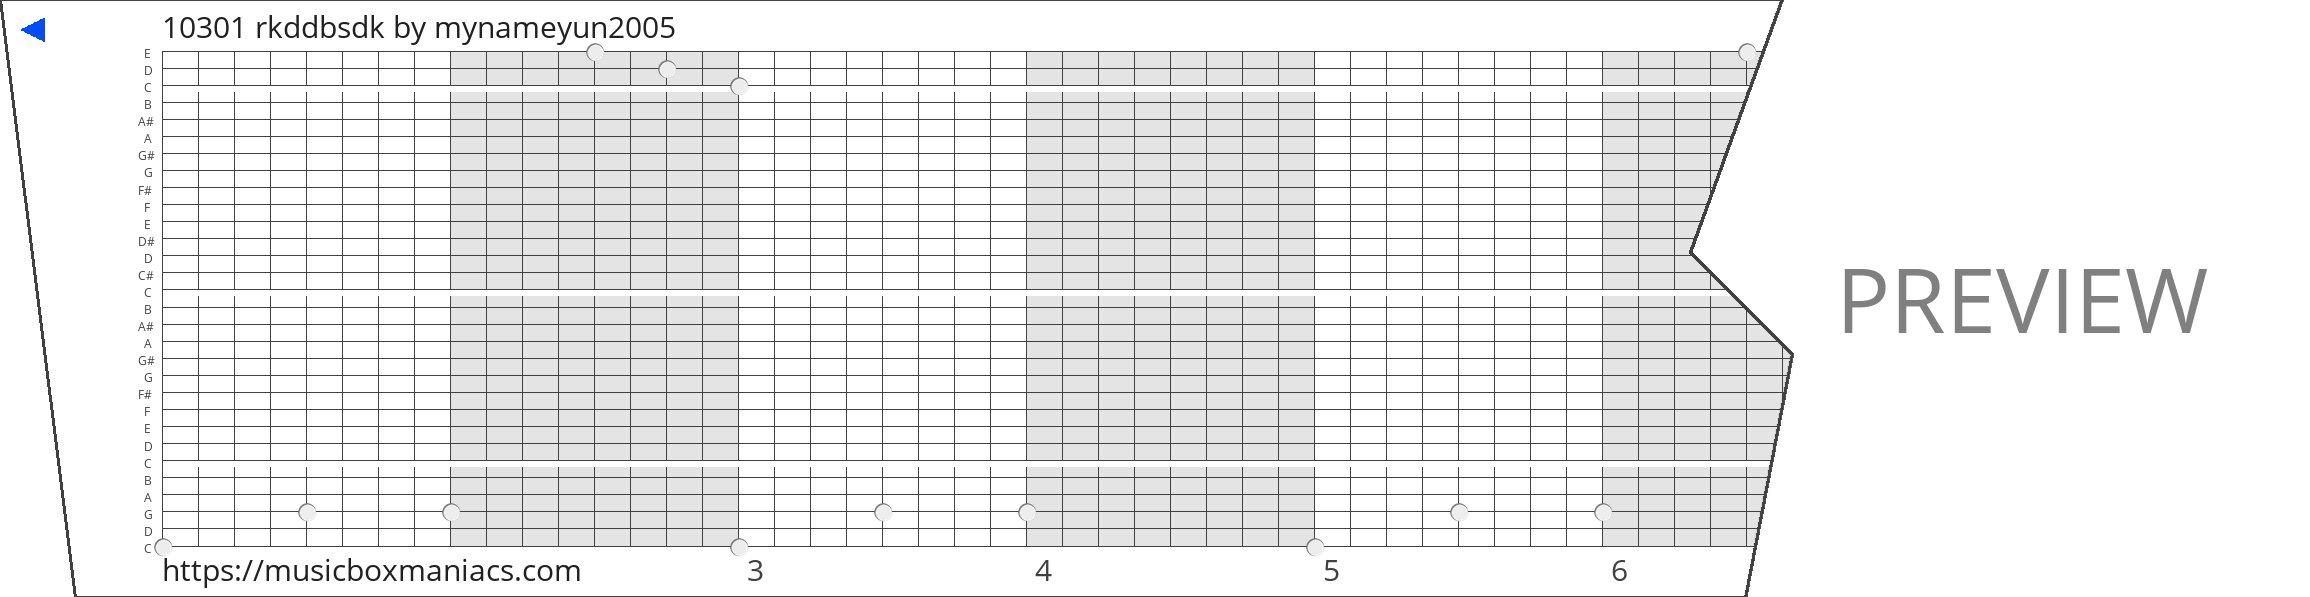 10301 rkddbsdk 30 note music box paper strip